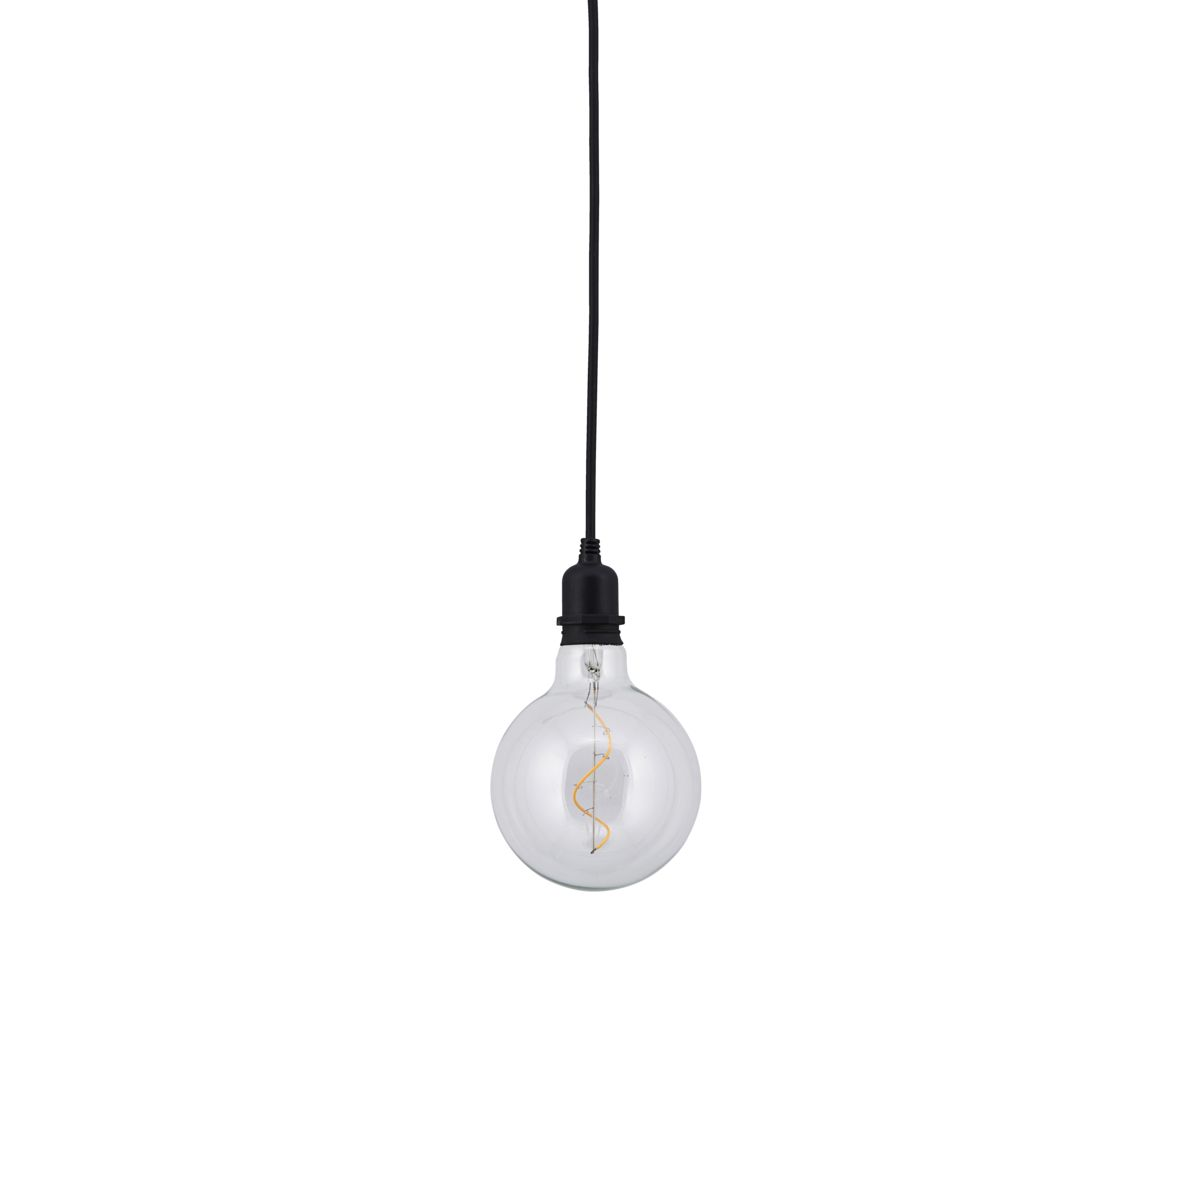 Lampa, Coso, Svart House Doctor